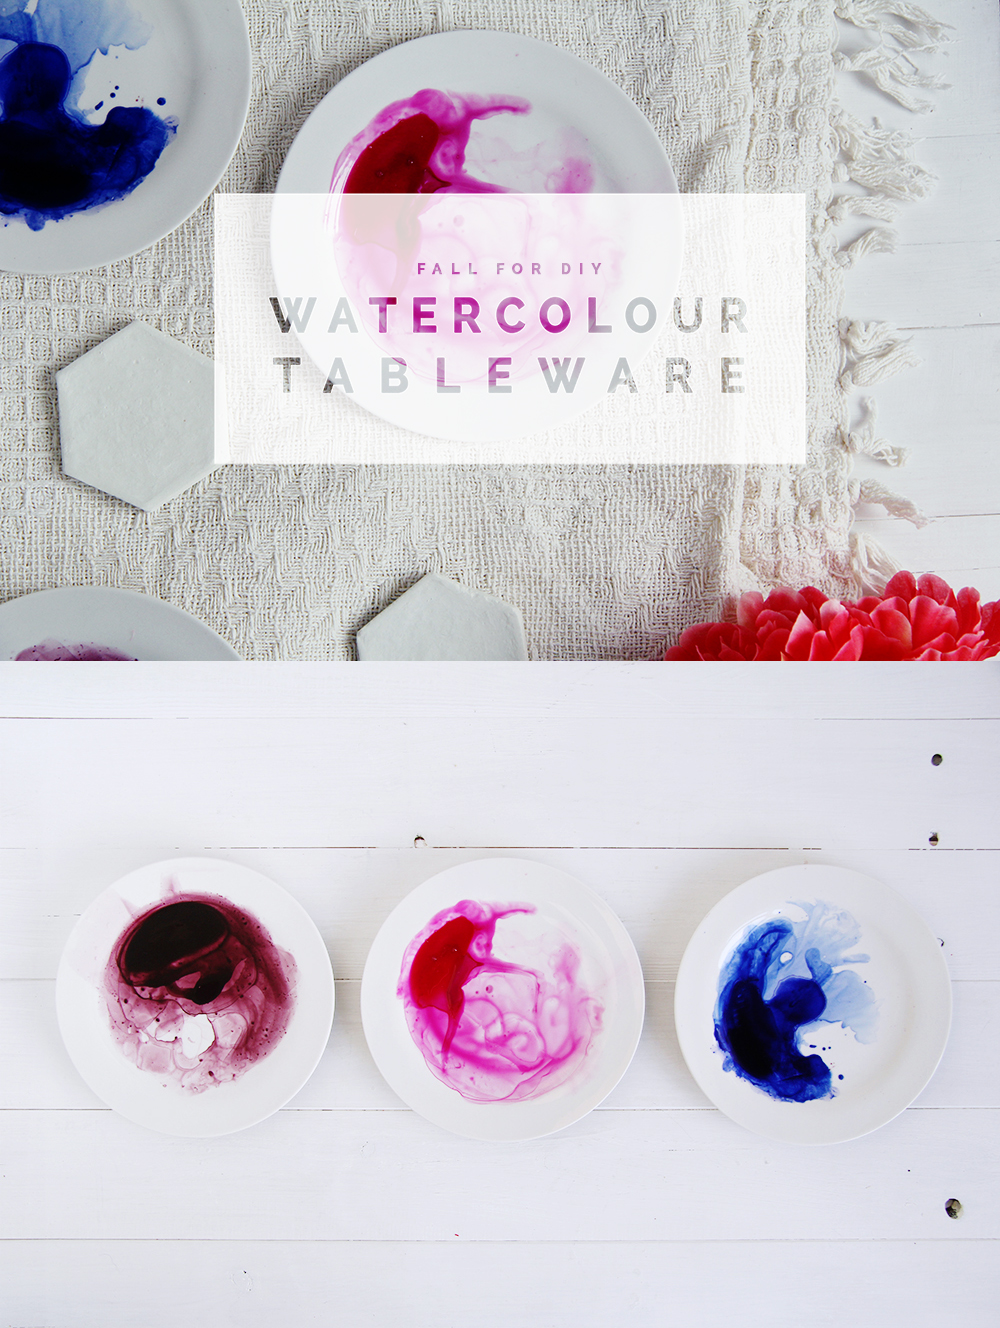 Fall-For-DIY-Watercolour-Tablewear